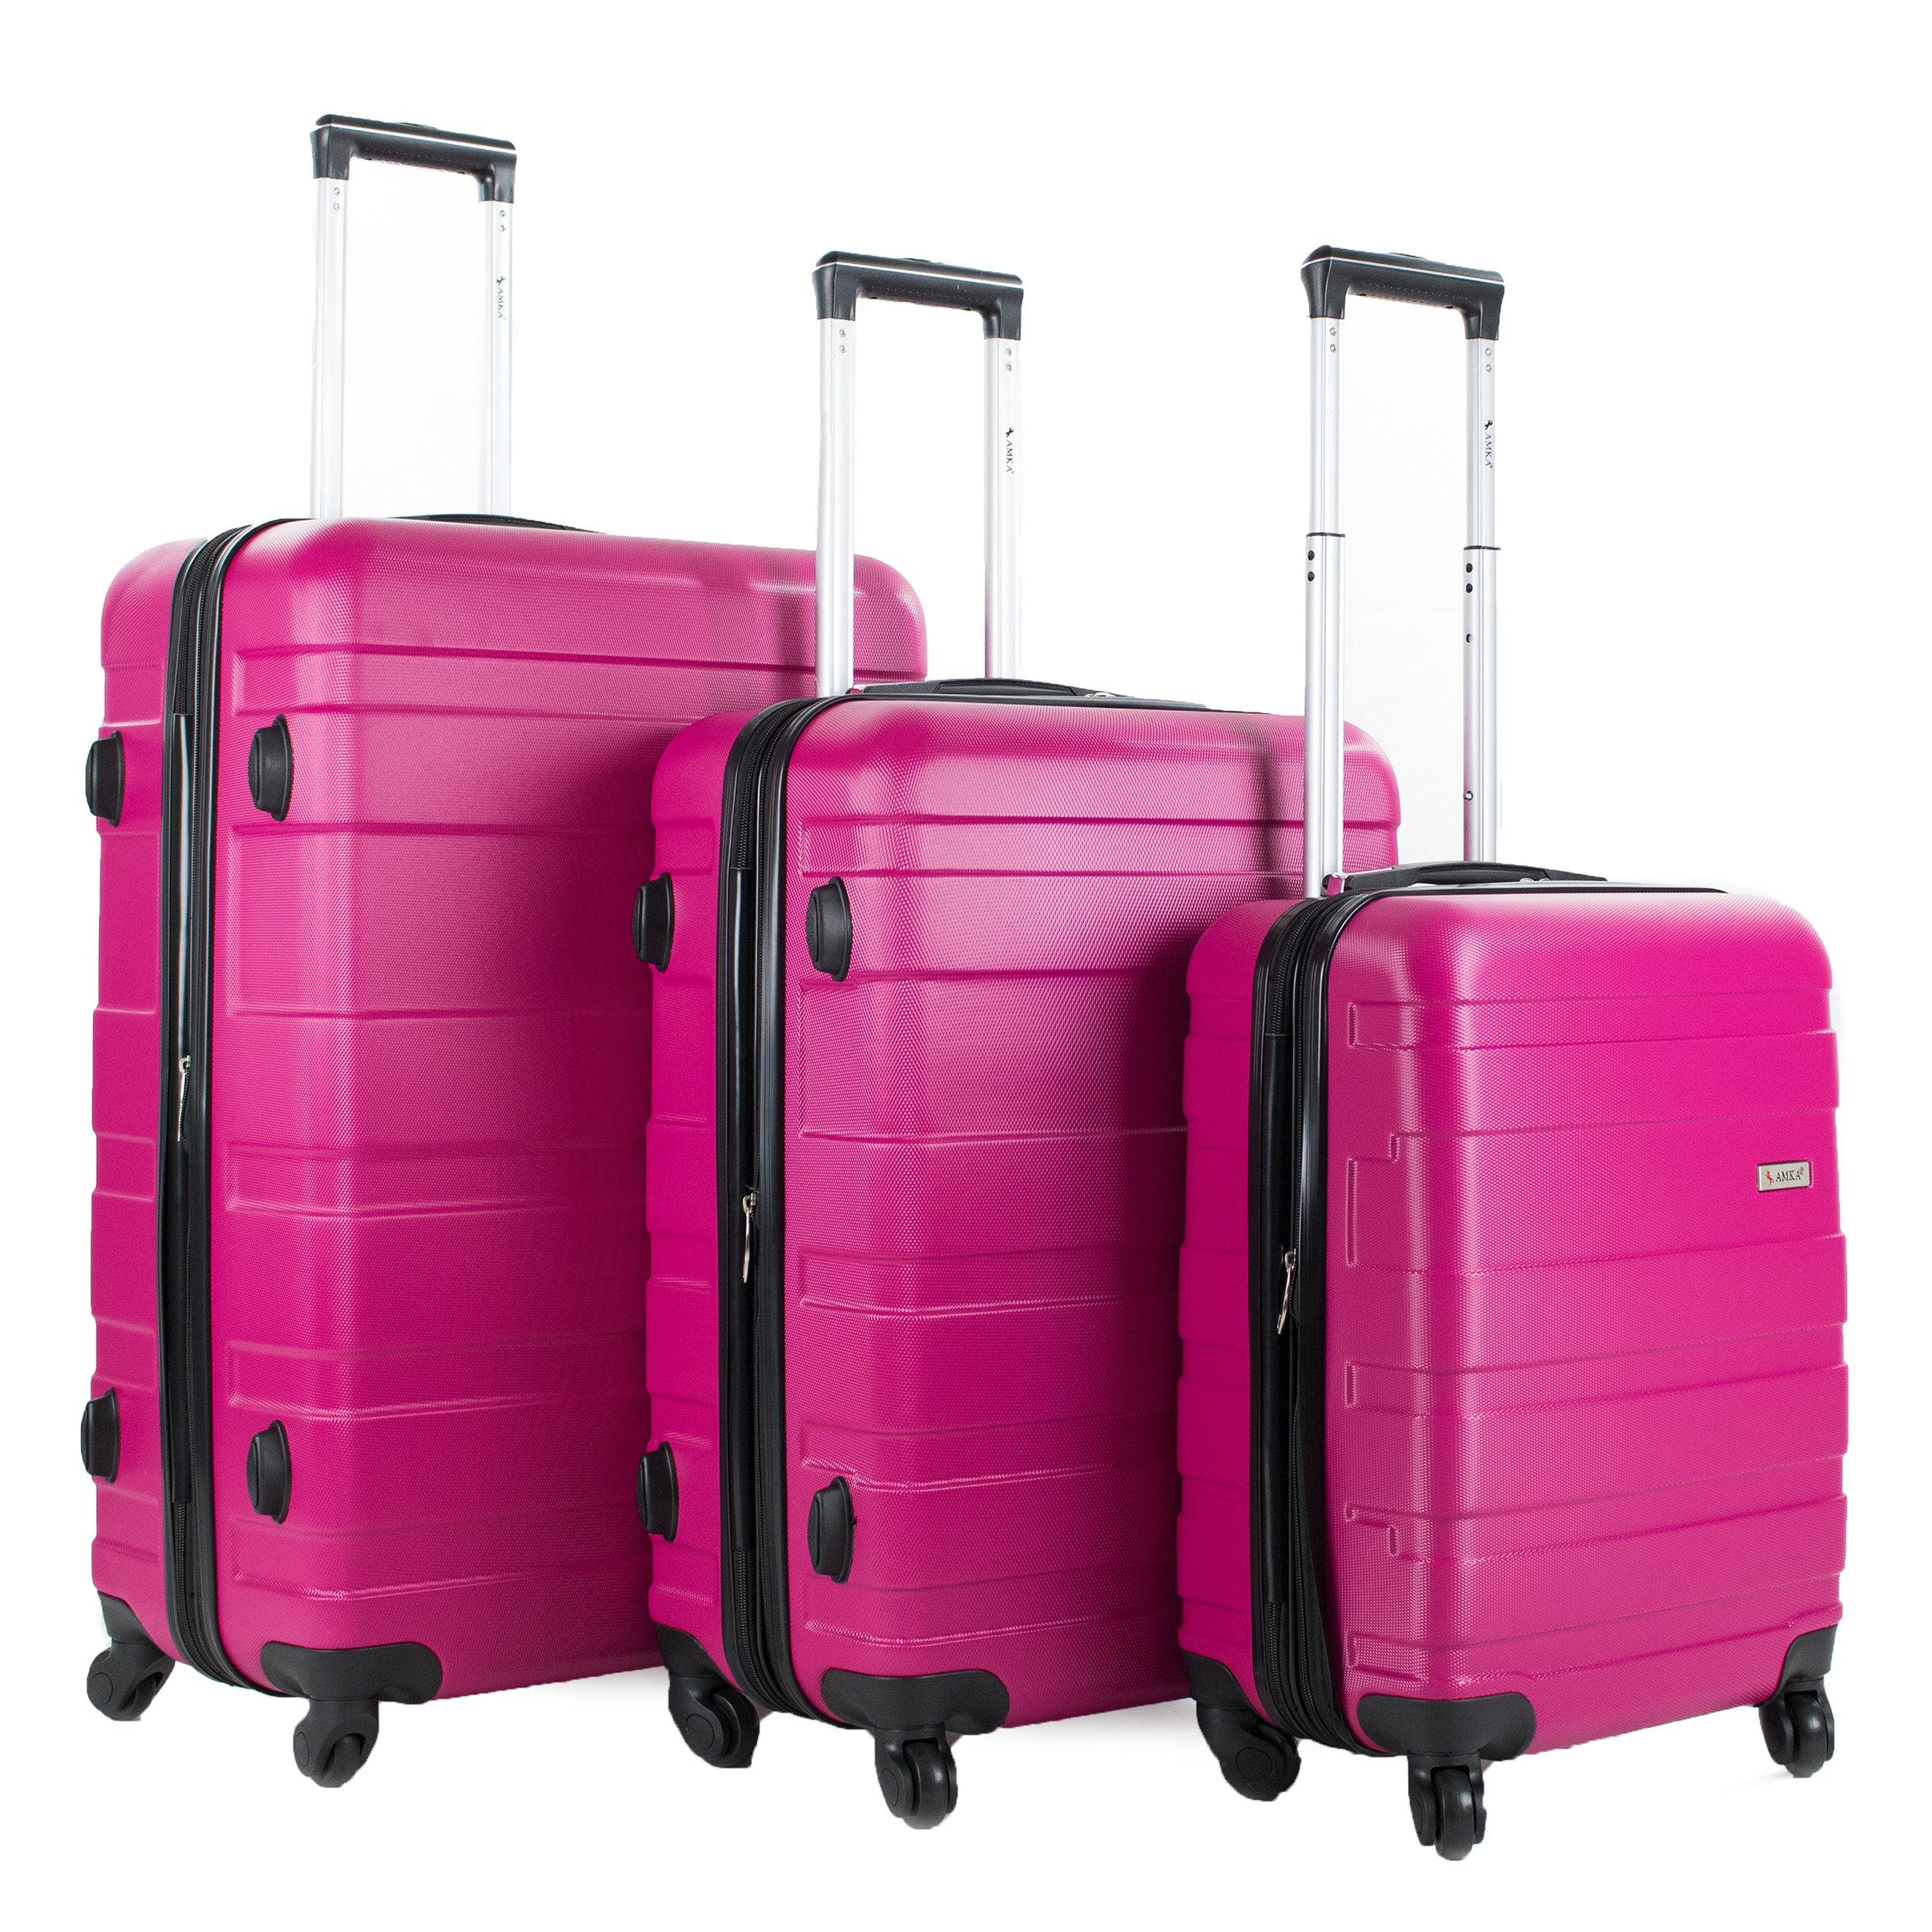 996-Pink-3000.jpg